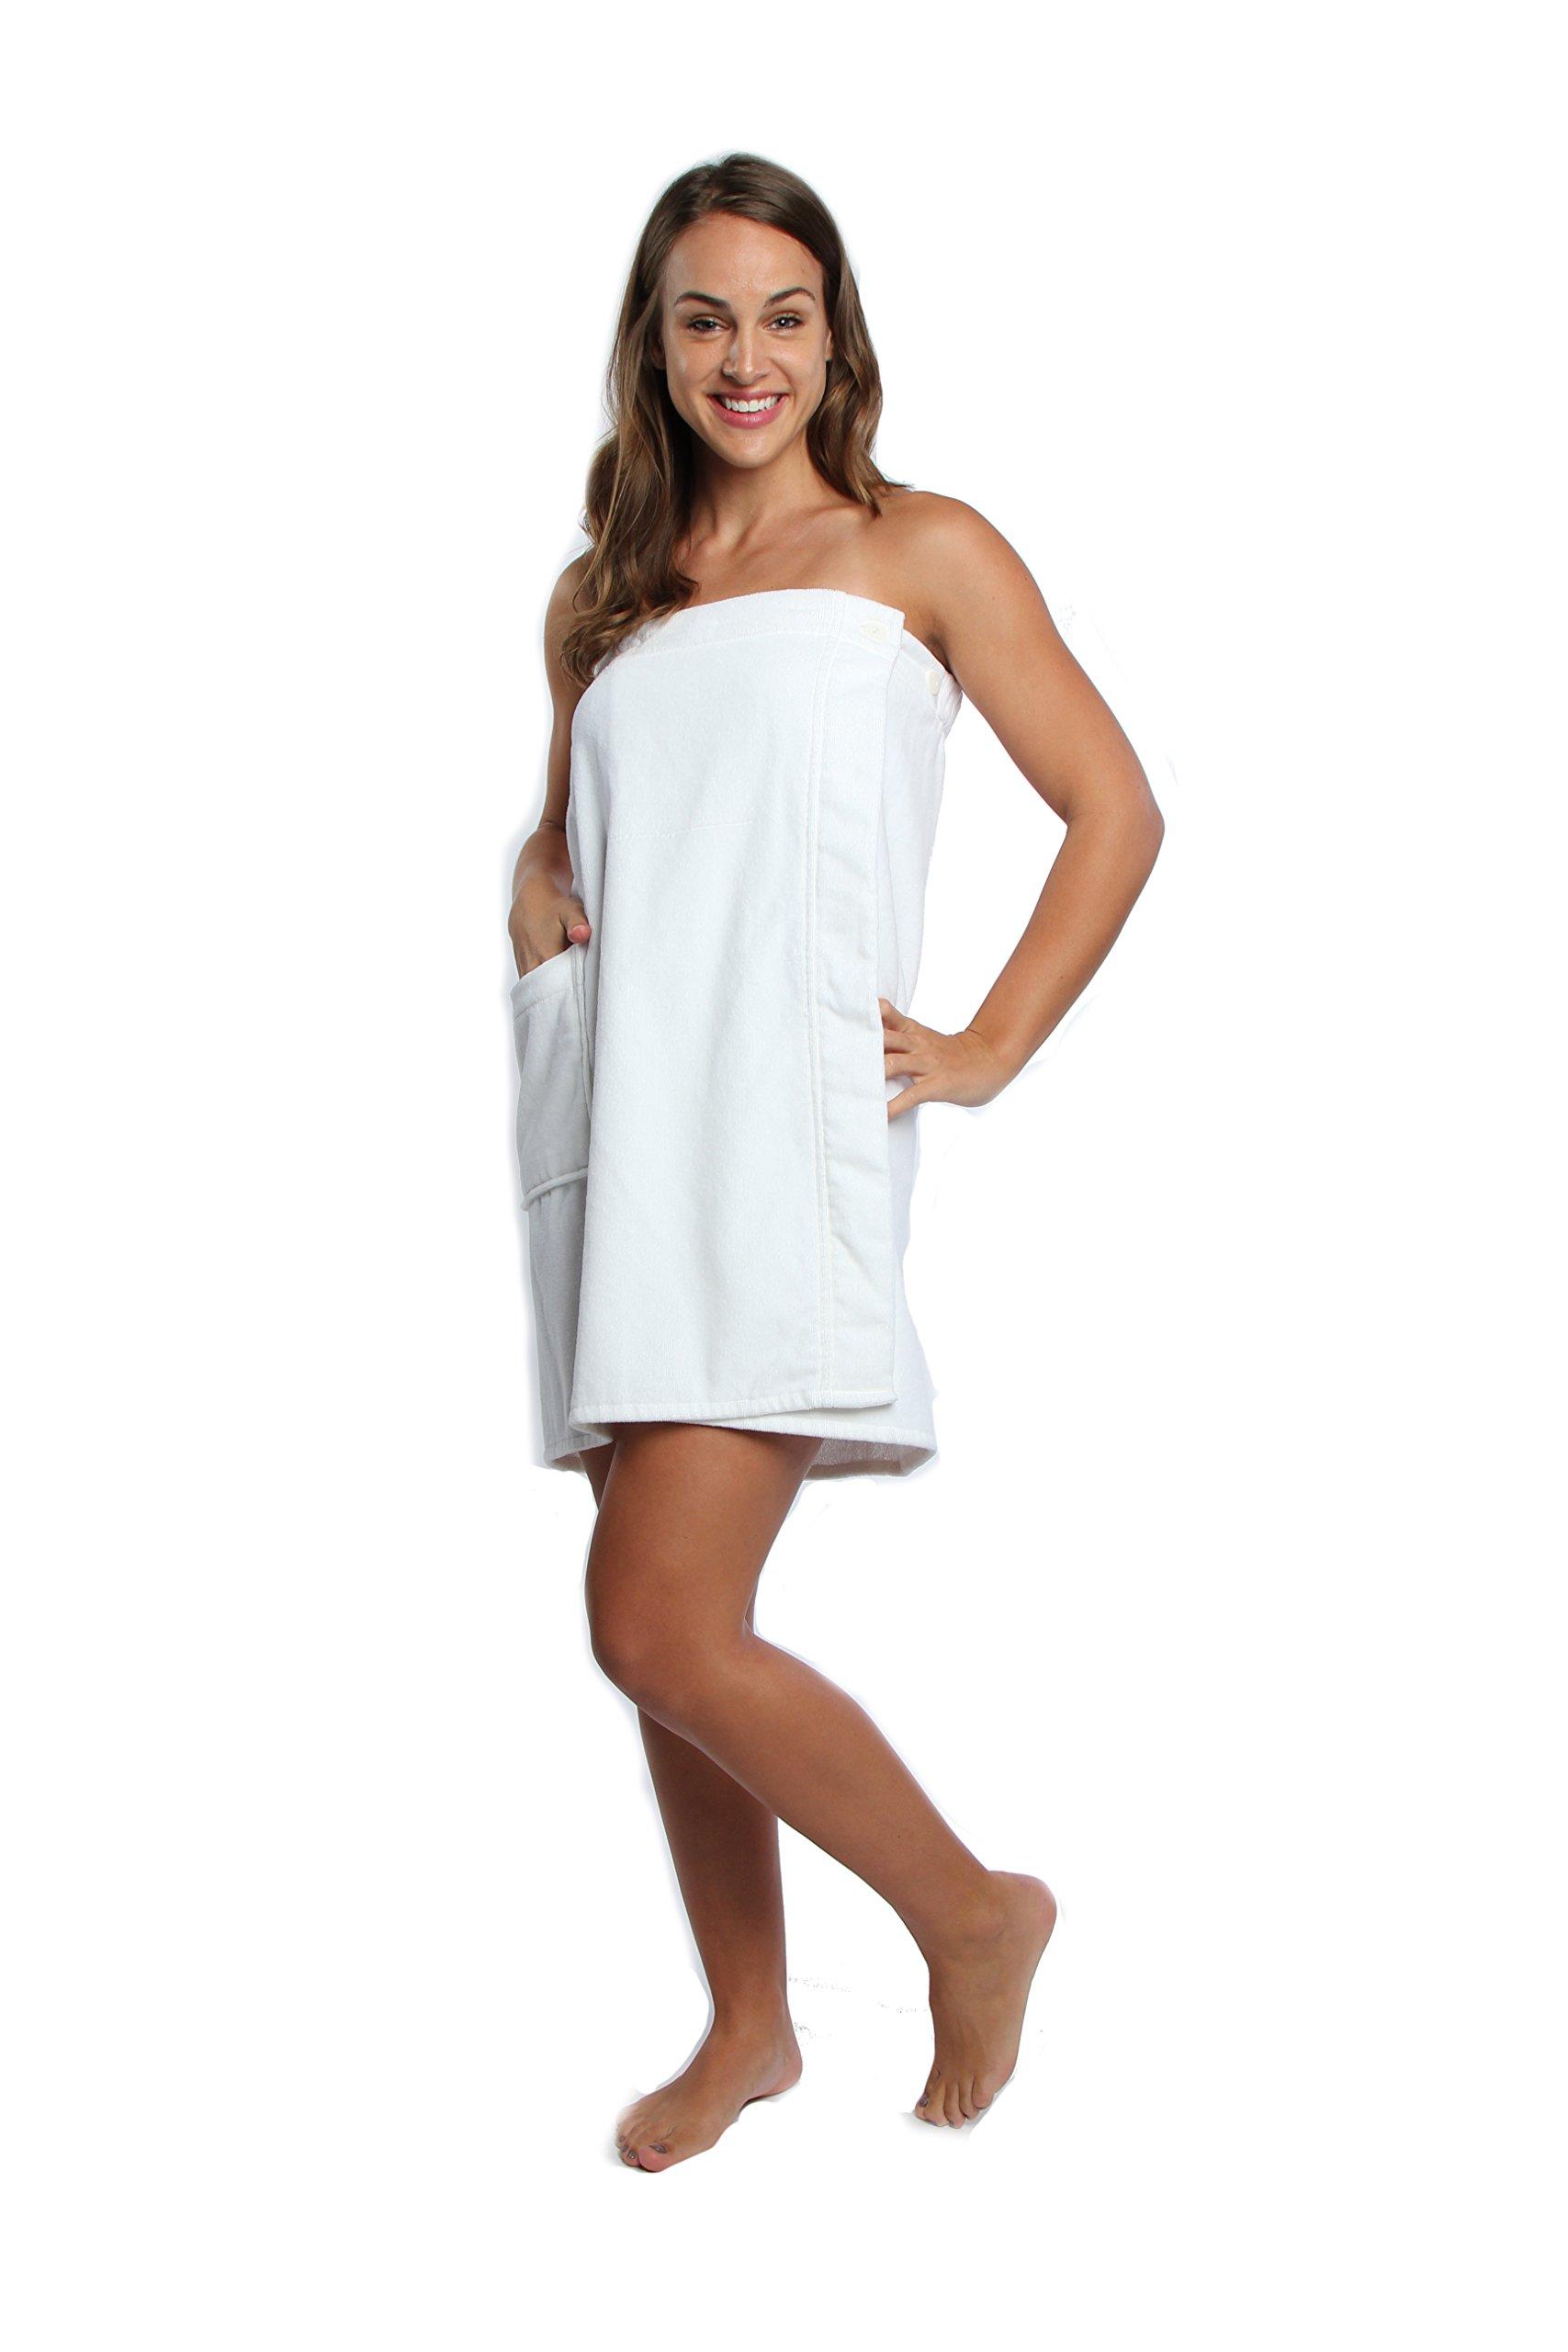 TurkishTowels Spa Towel Wrap (Large, White) by TurkishTowels